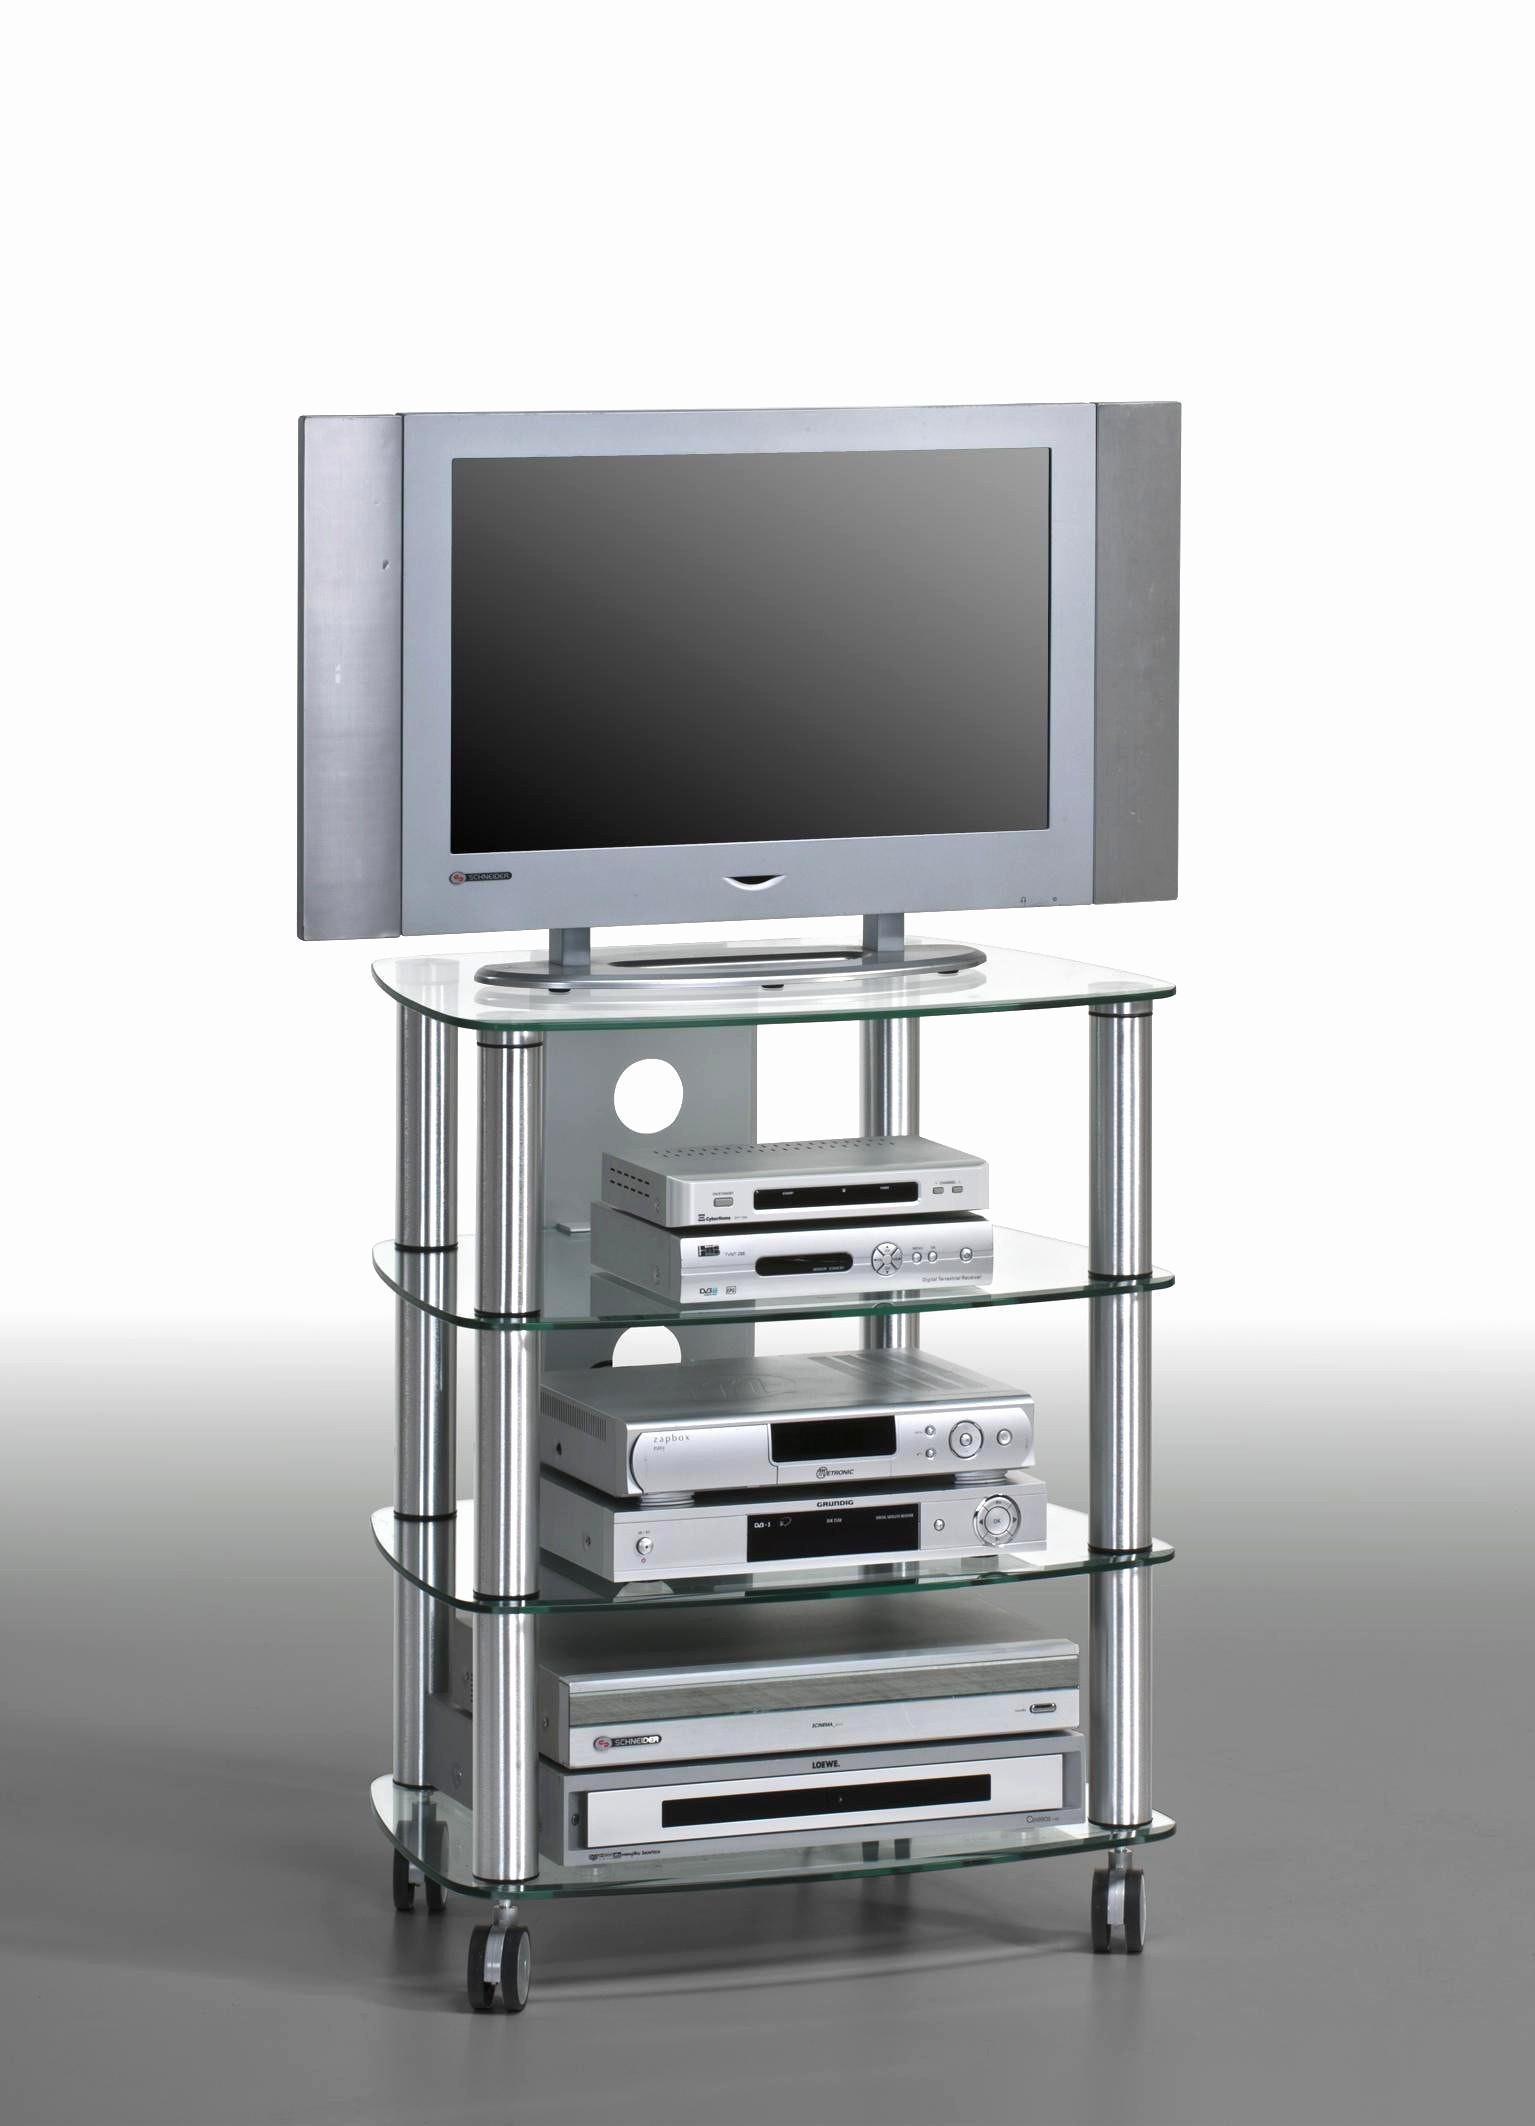 Meuble tv suspendu imitation bois